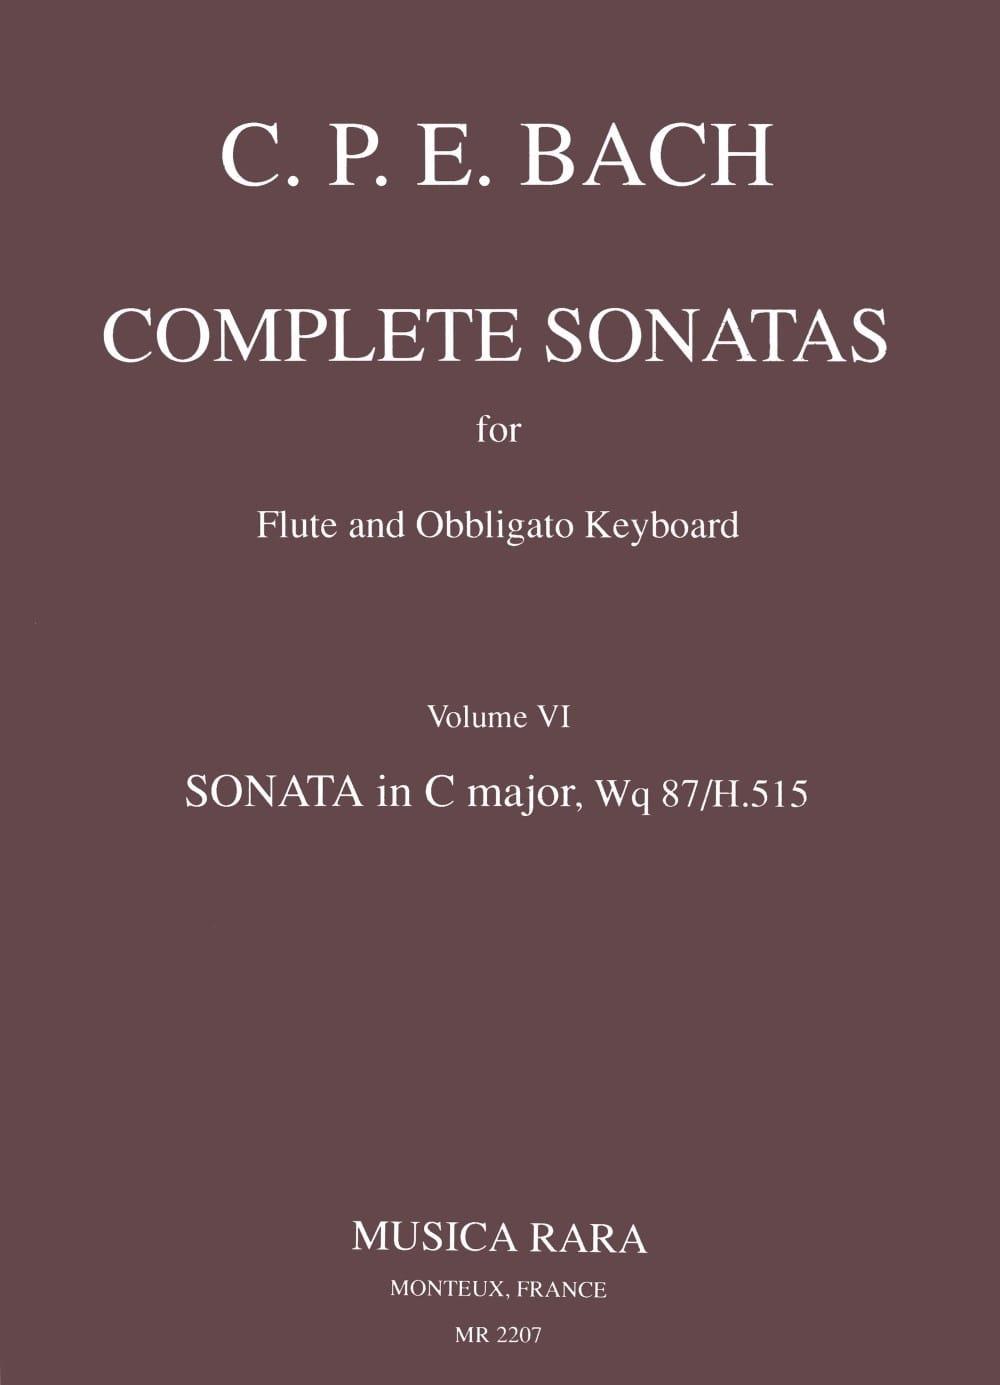 Complete sonatas - Volume 6 - Flute Clavecin (Epuisé) - laflutedepan.com